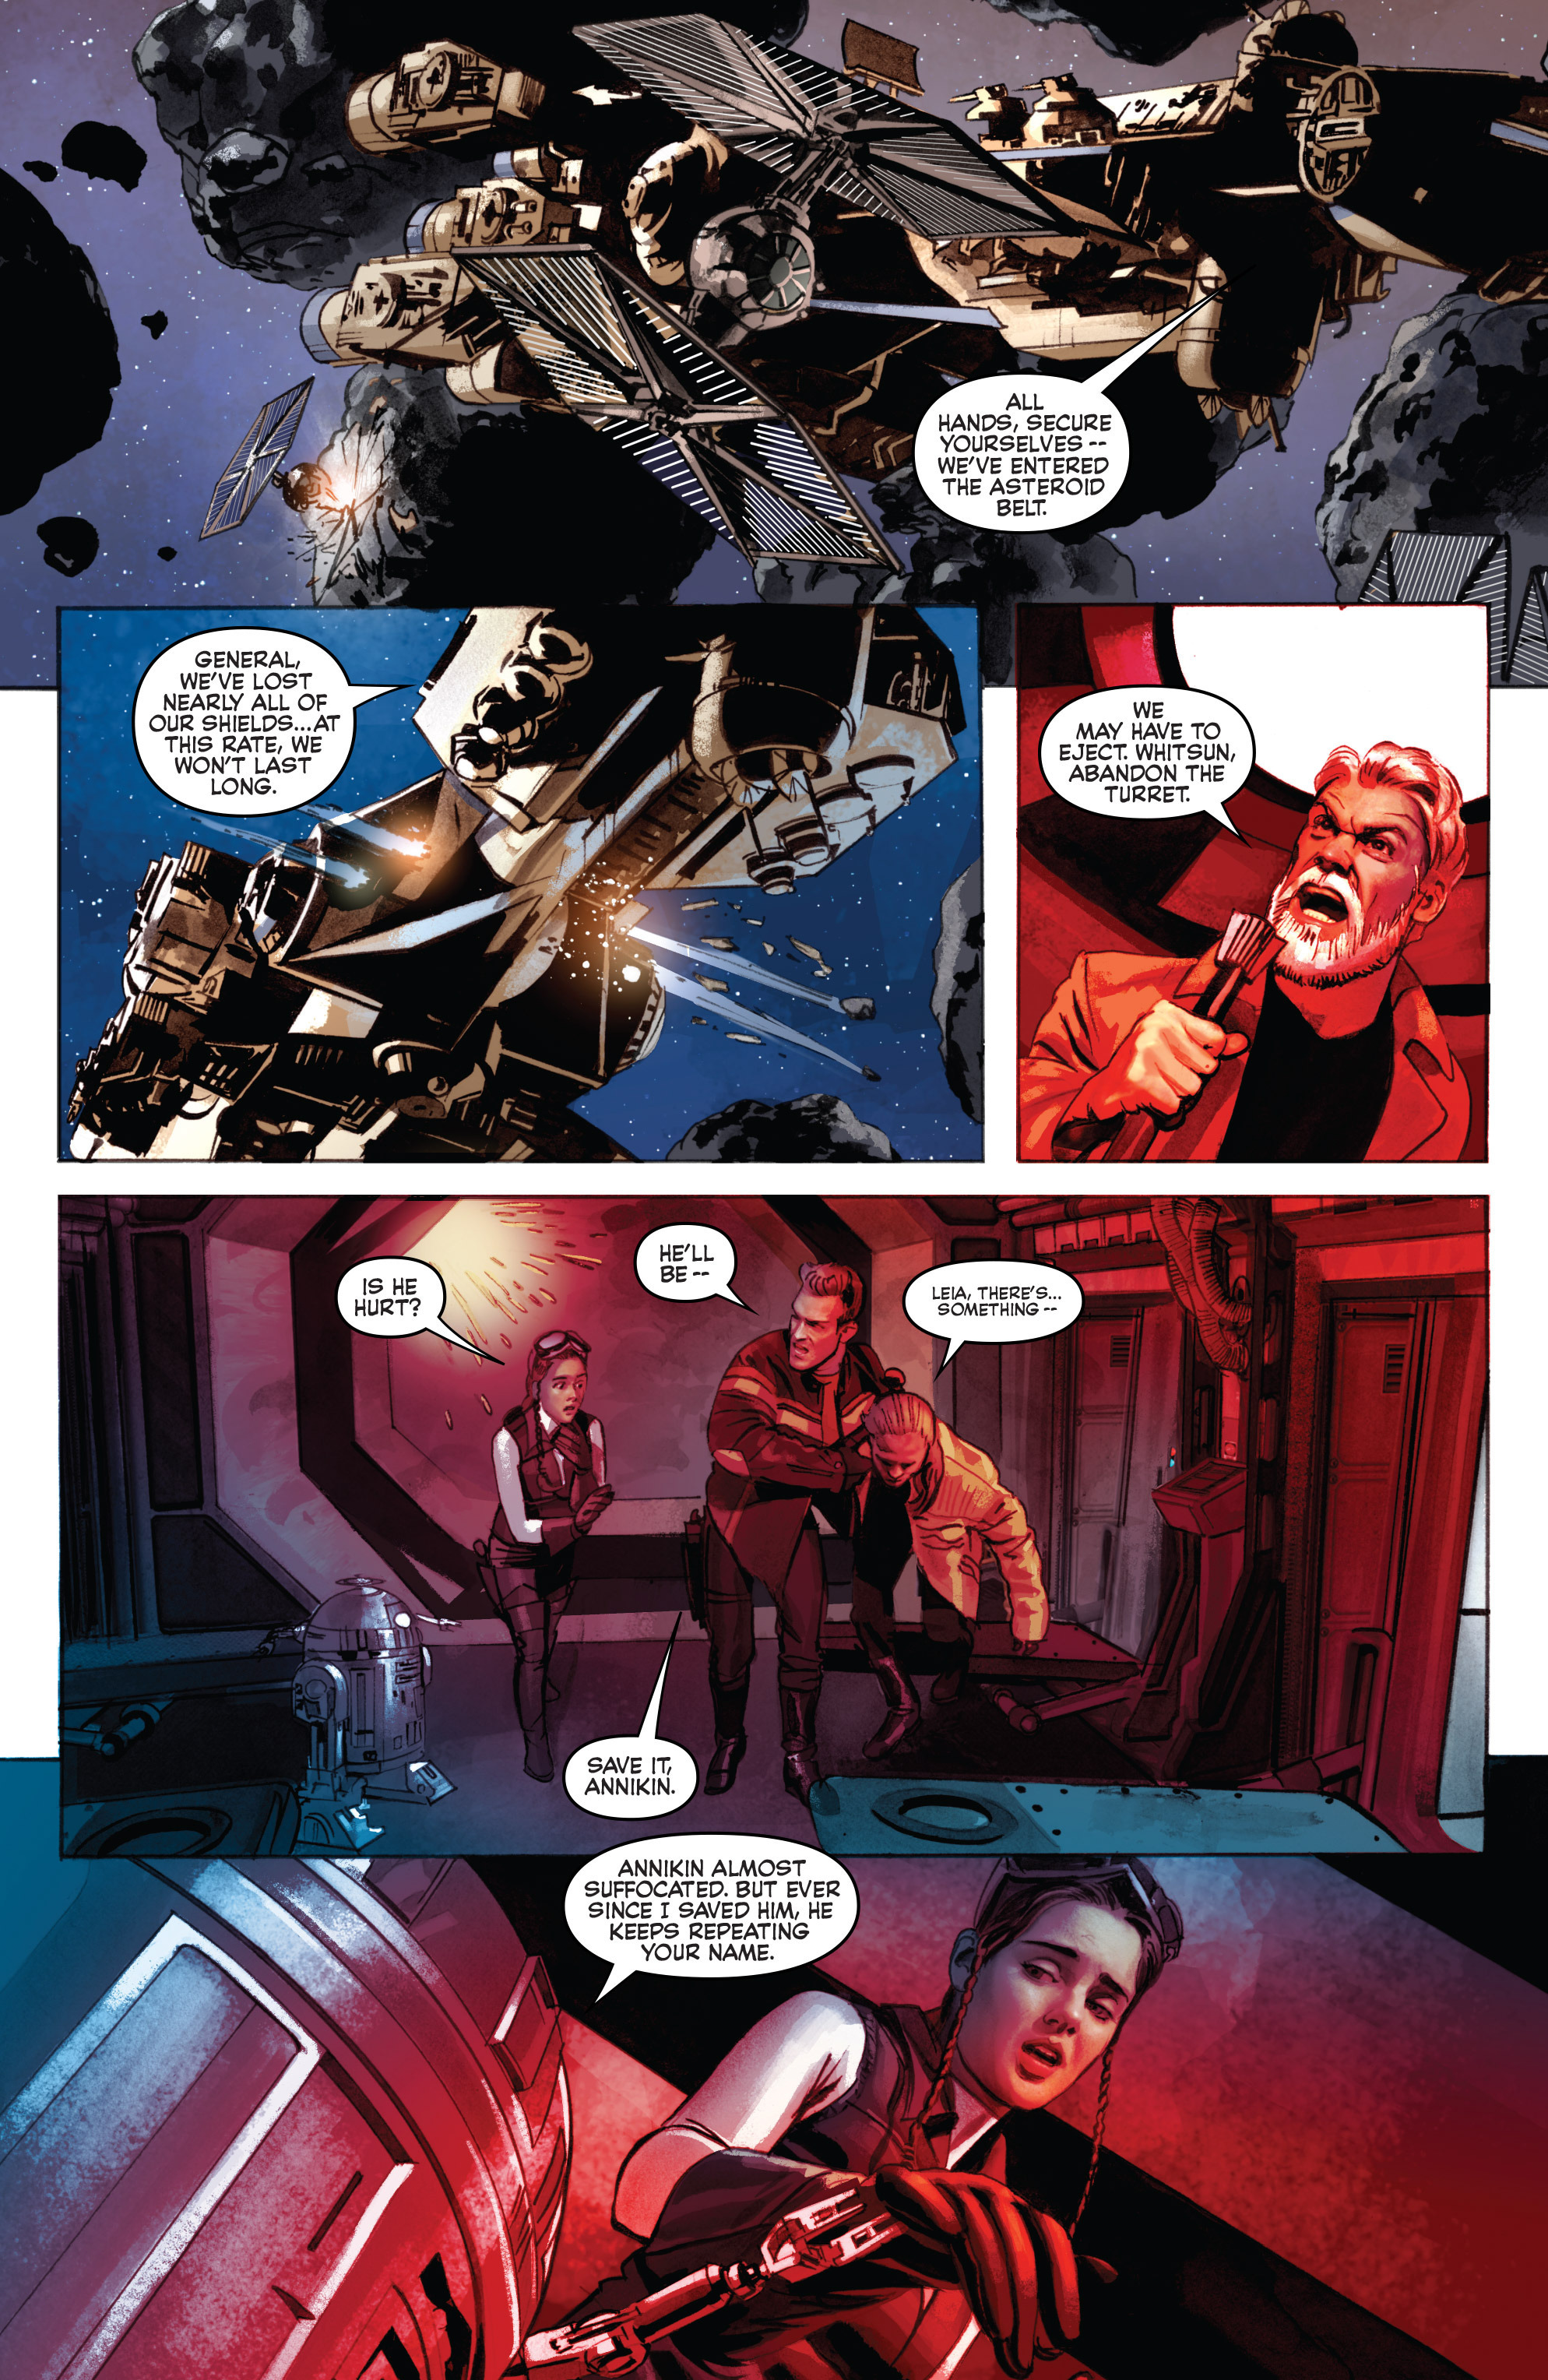 THE STAR WARS comic (2015, Marvel edition) Vol.7 7